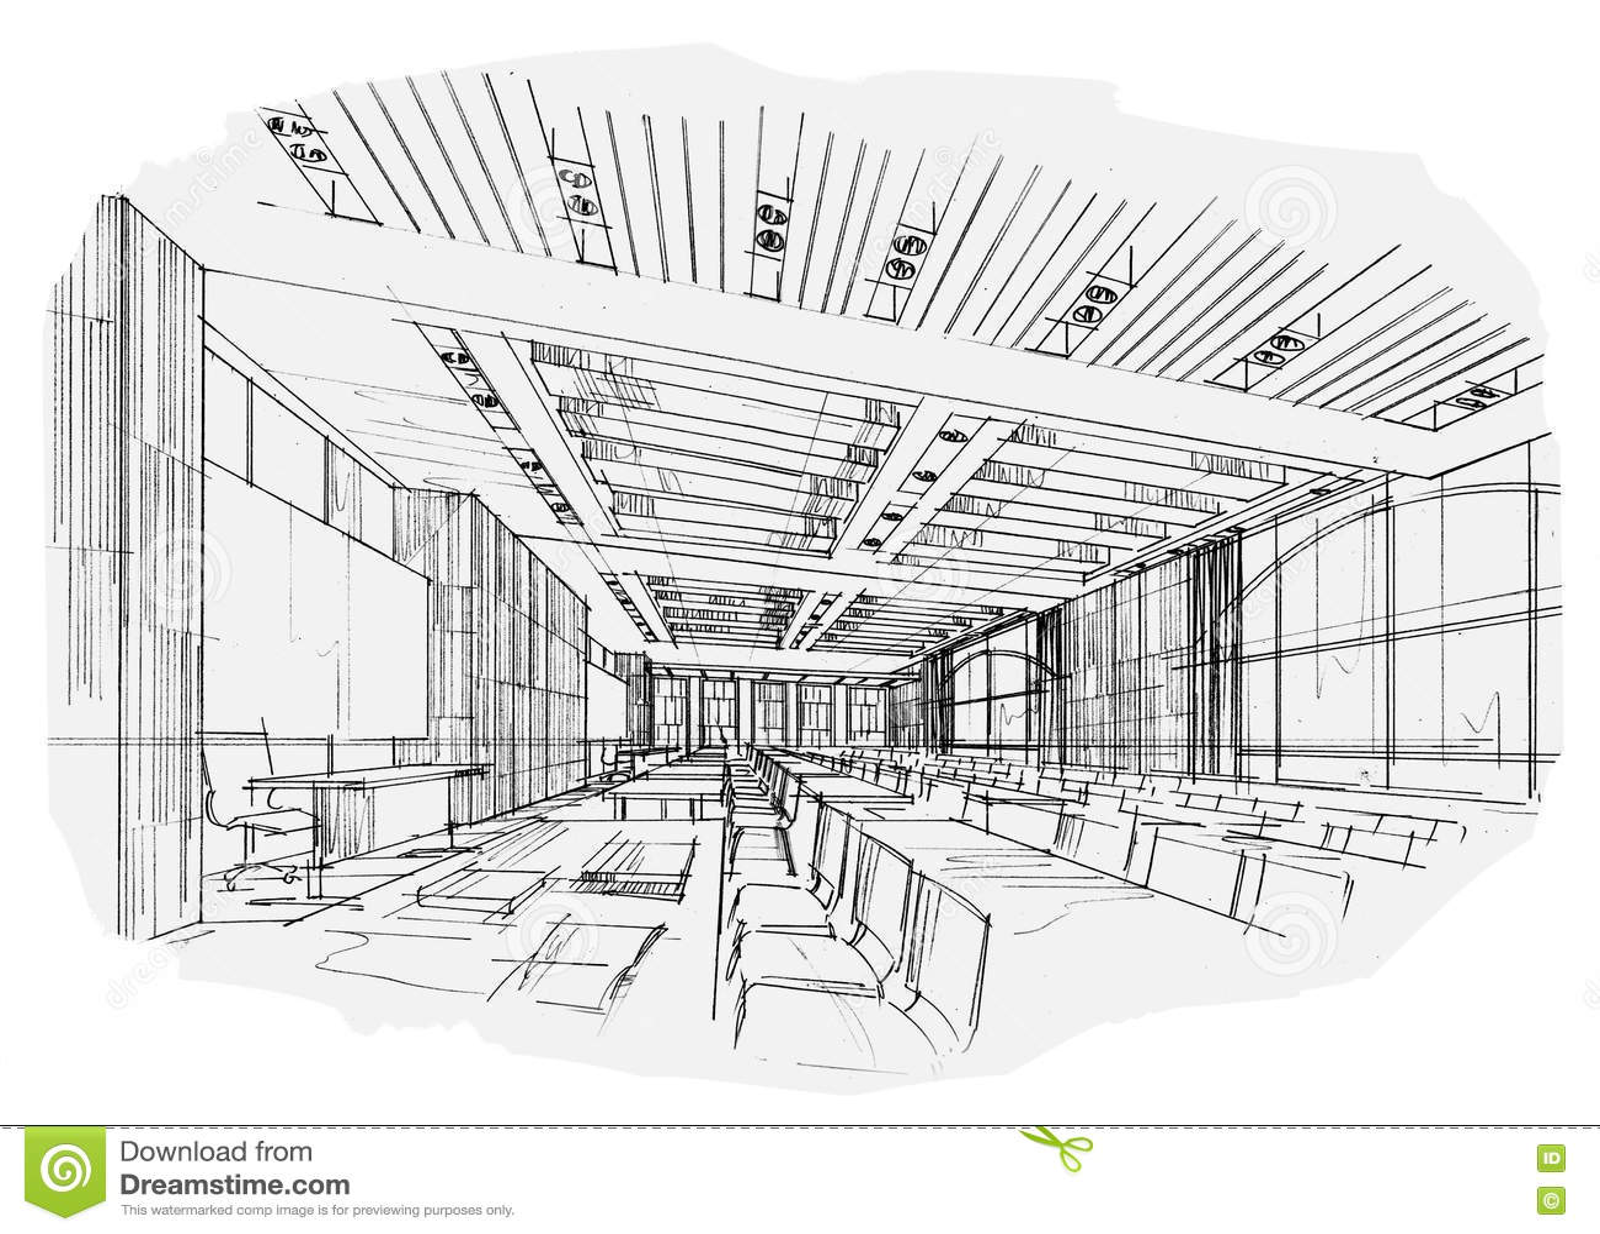 Sala De Aula Interior Da Perspectiva Do Esboco Design De Interiores Preto E Branco Ilustracao